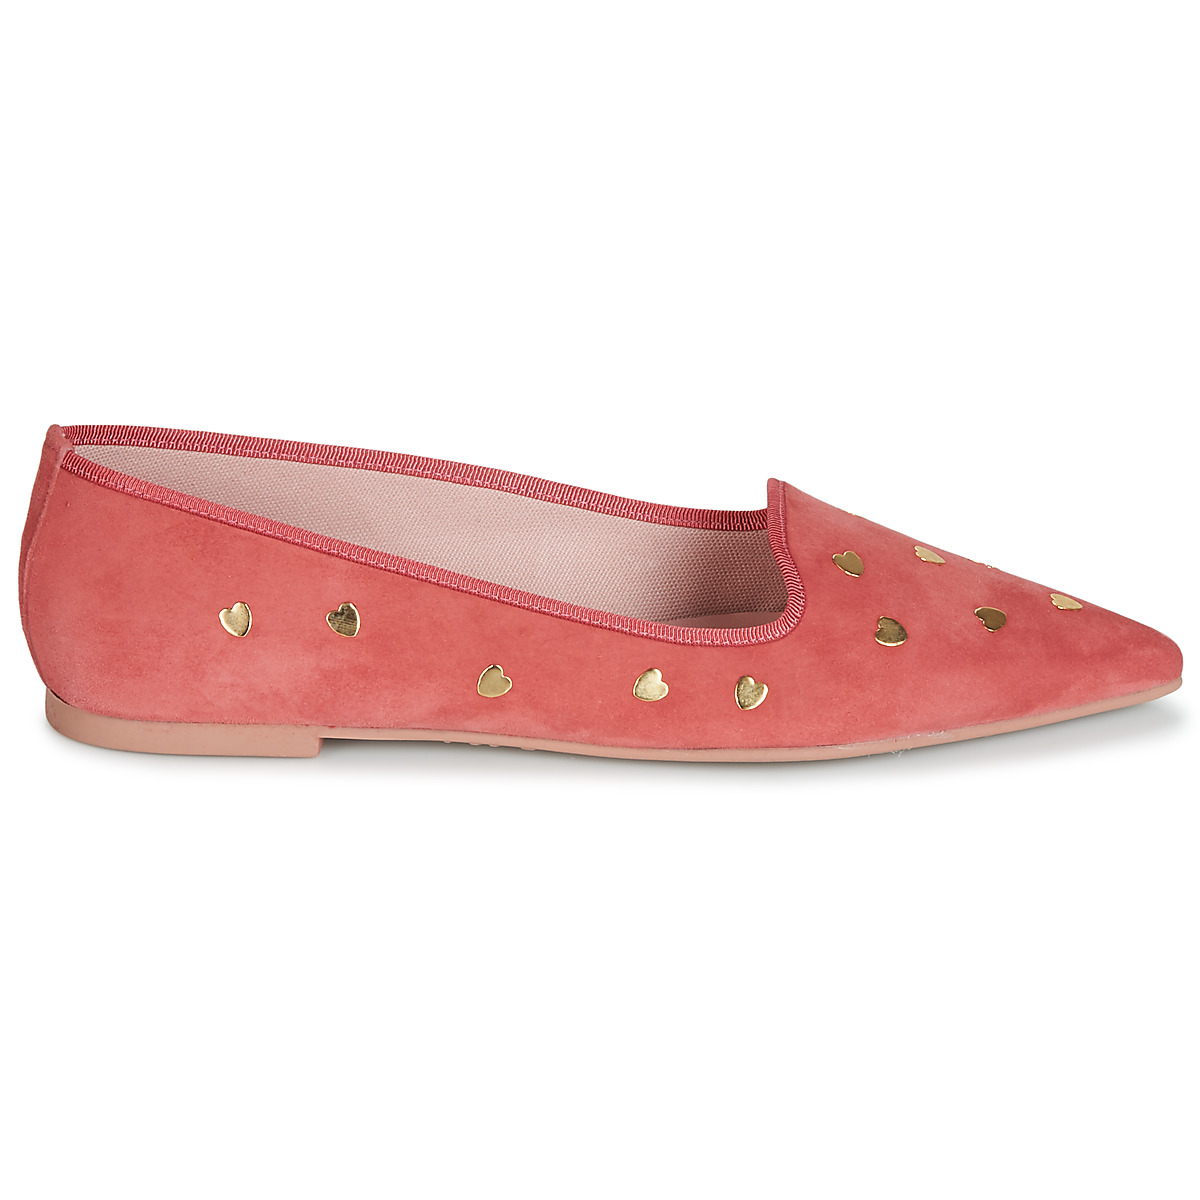 Pretty Ballerinas Maha Rose - Livraison Gratuite Chaussures Ballerines Femme 169,00 €